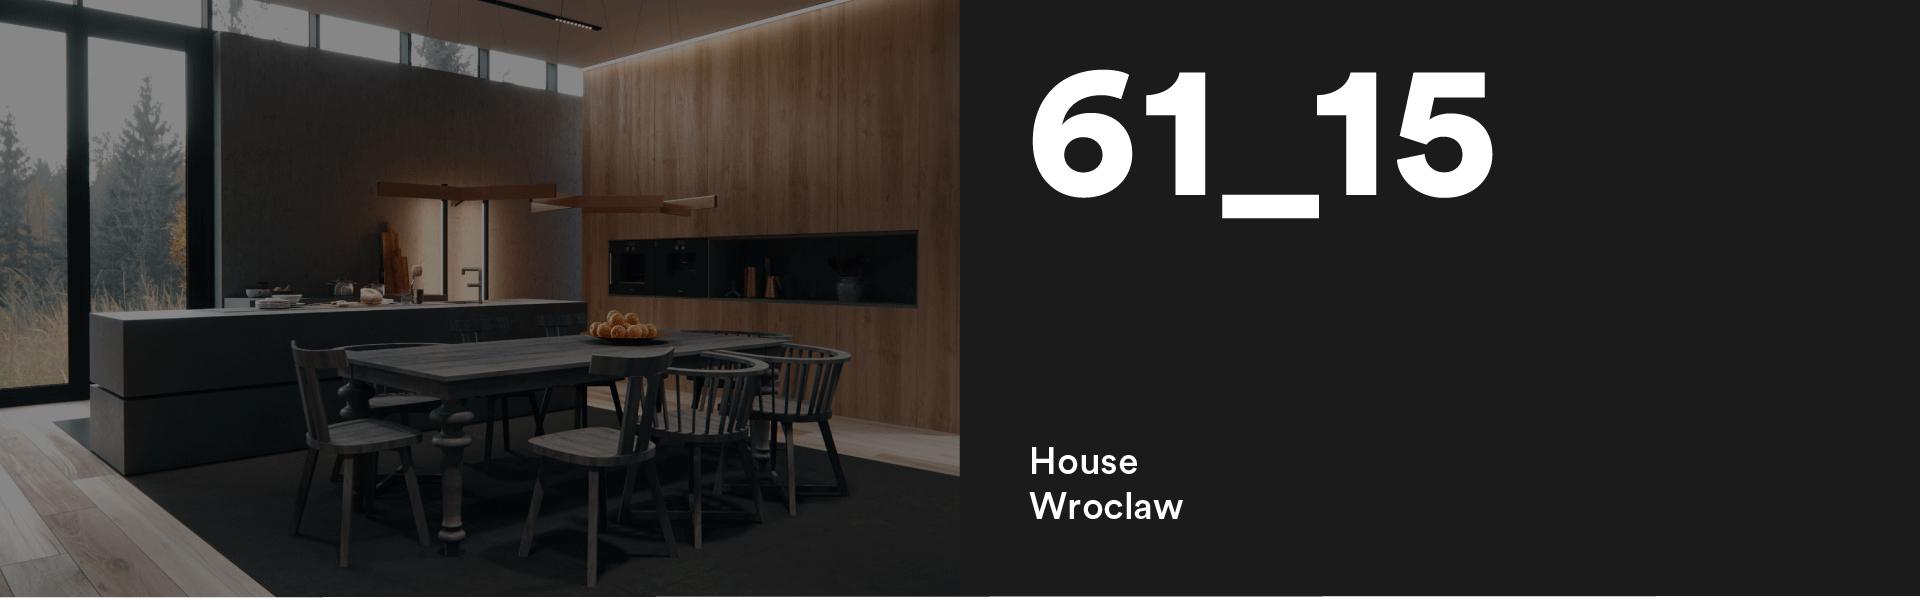 61_15 Wroclaw House